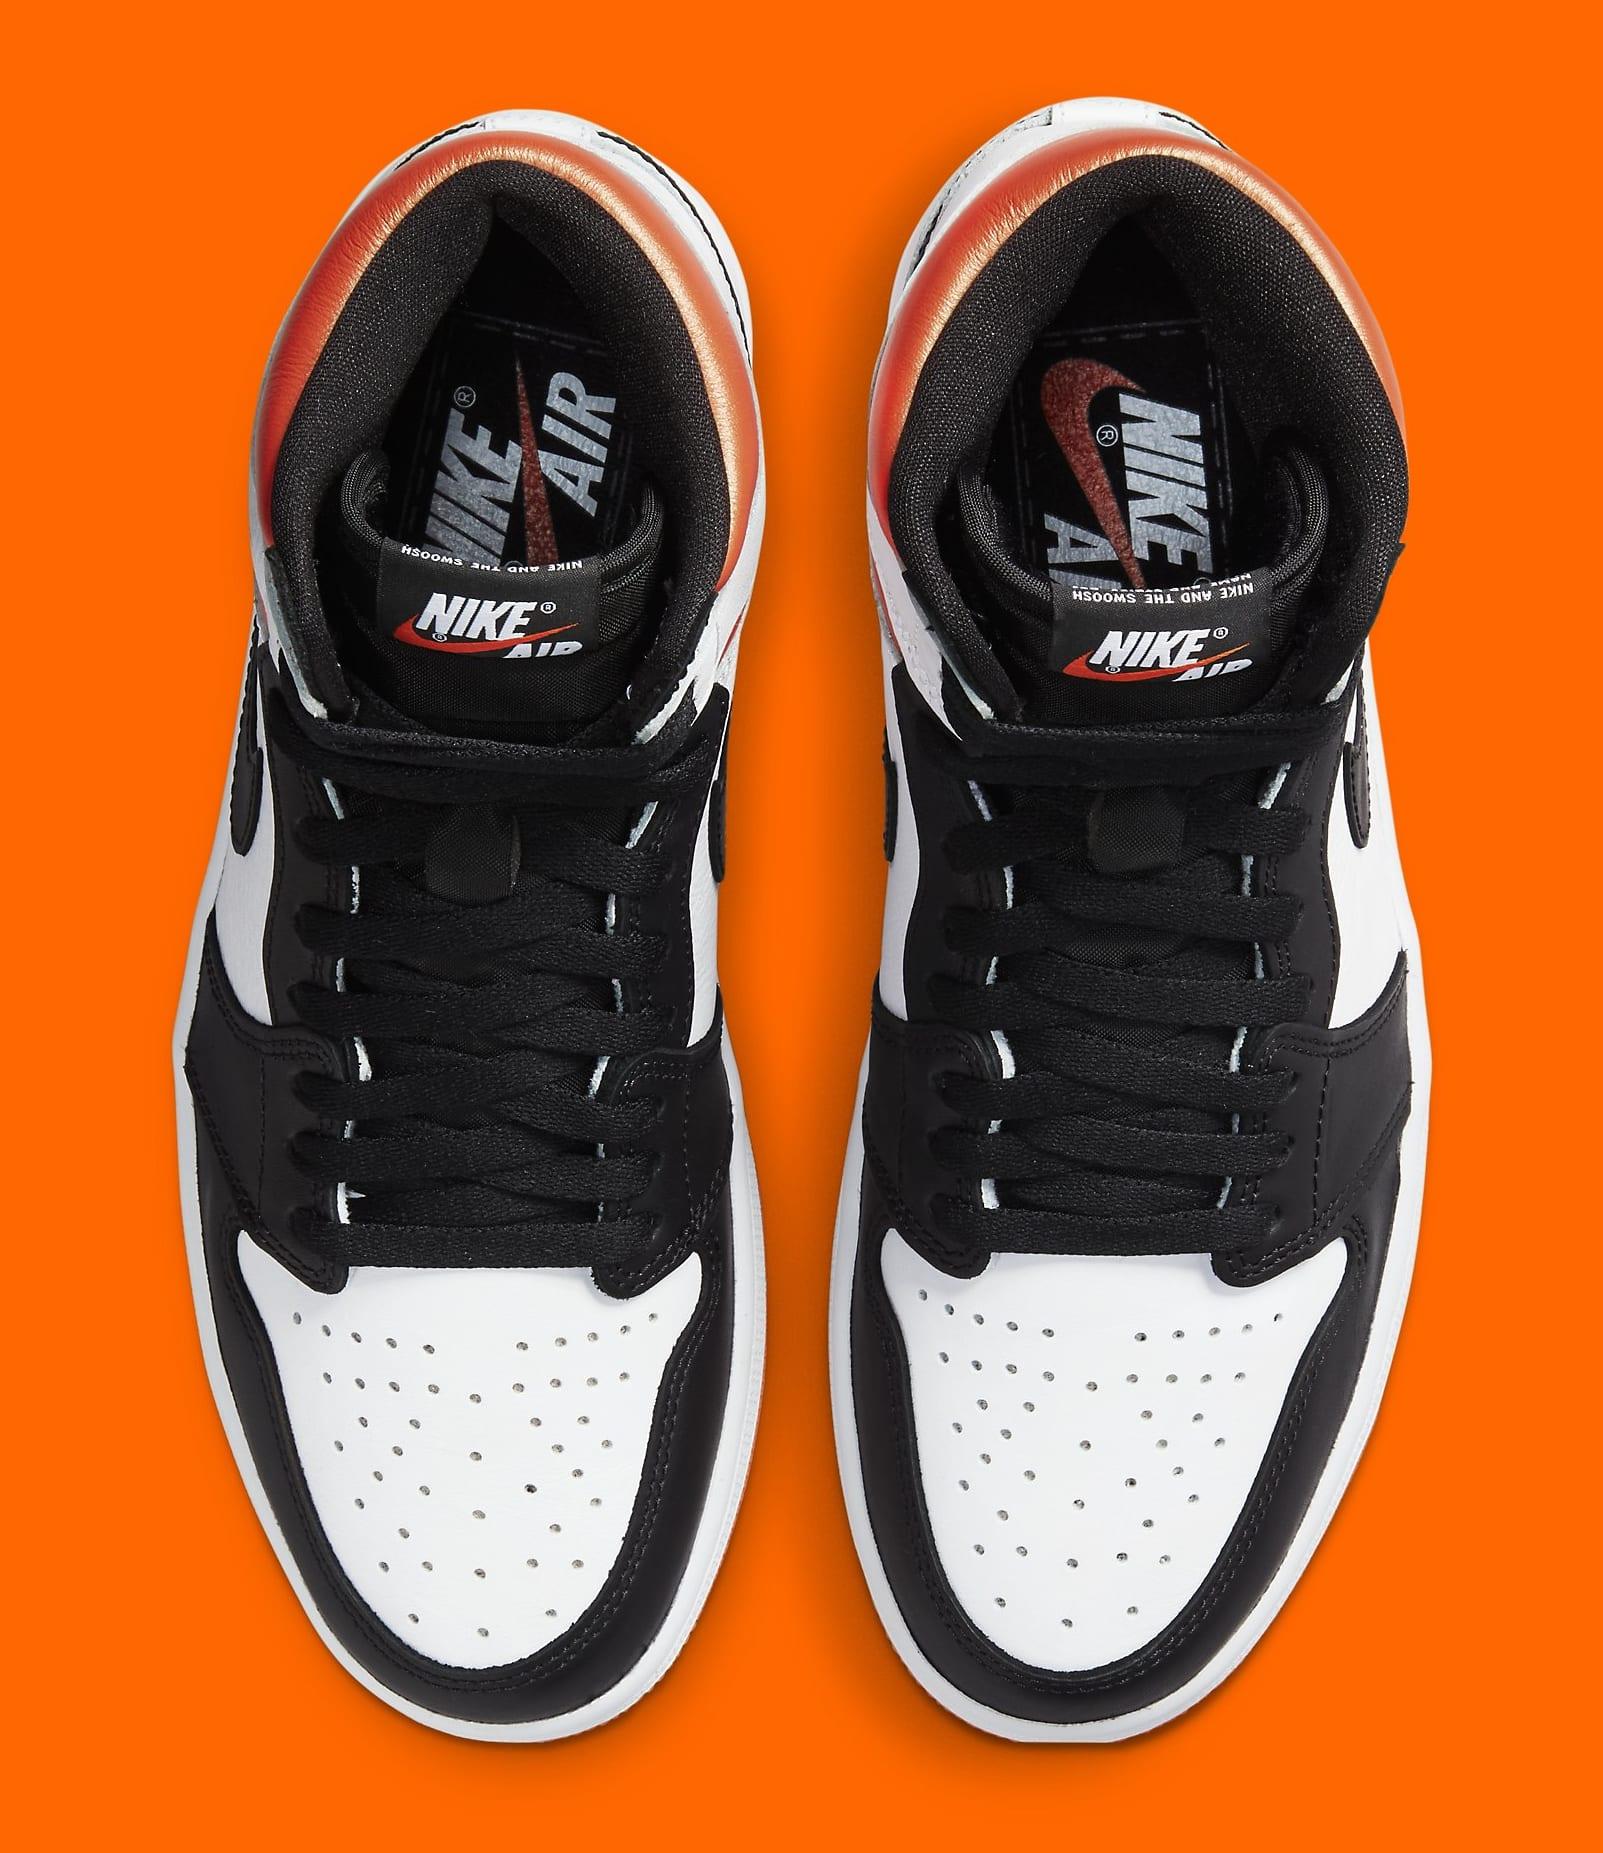 Air Jordan 1 Retro High OG 'Electro Orange' 555088-180 Top